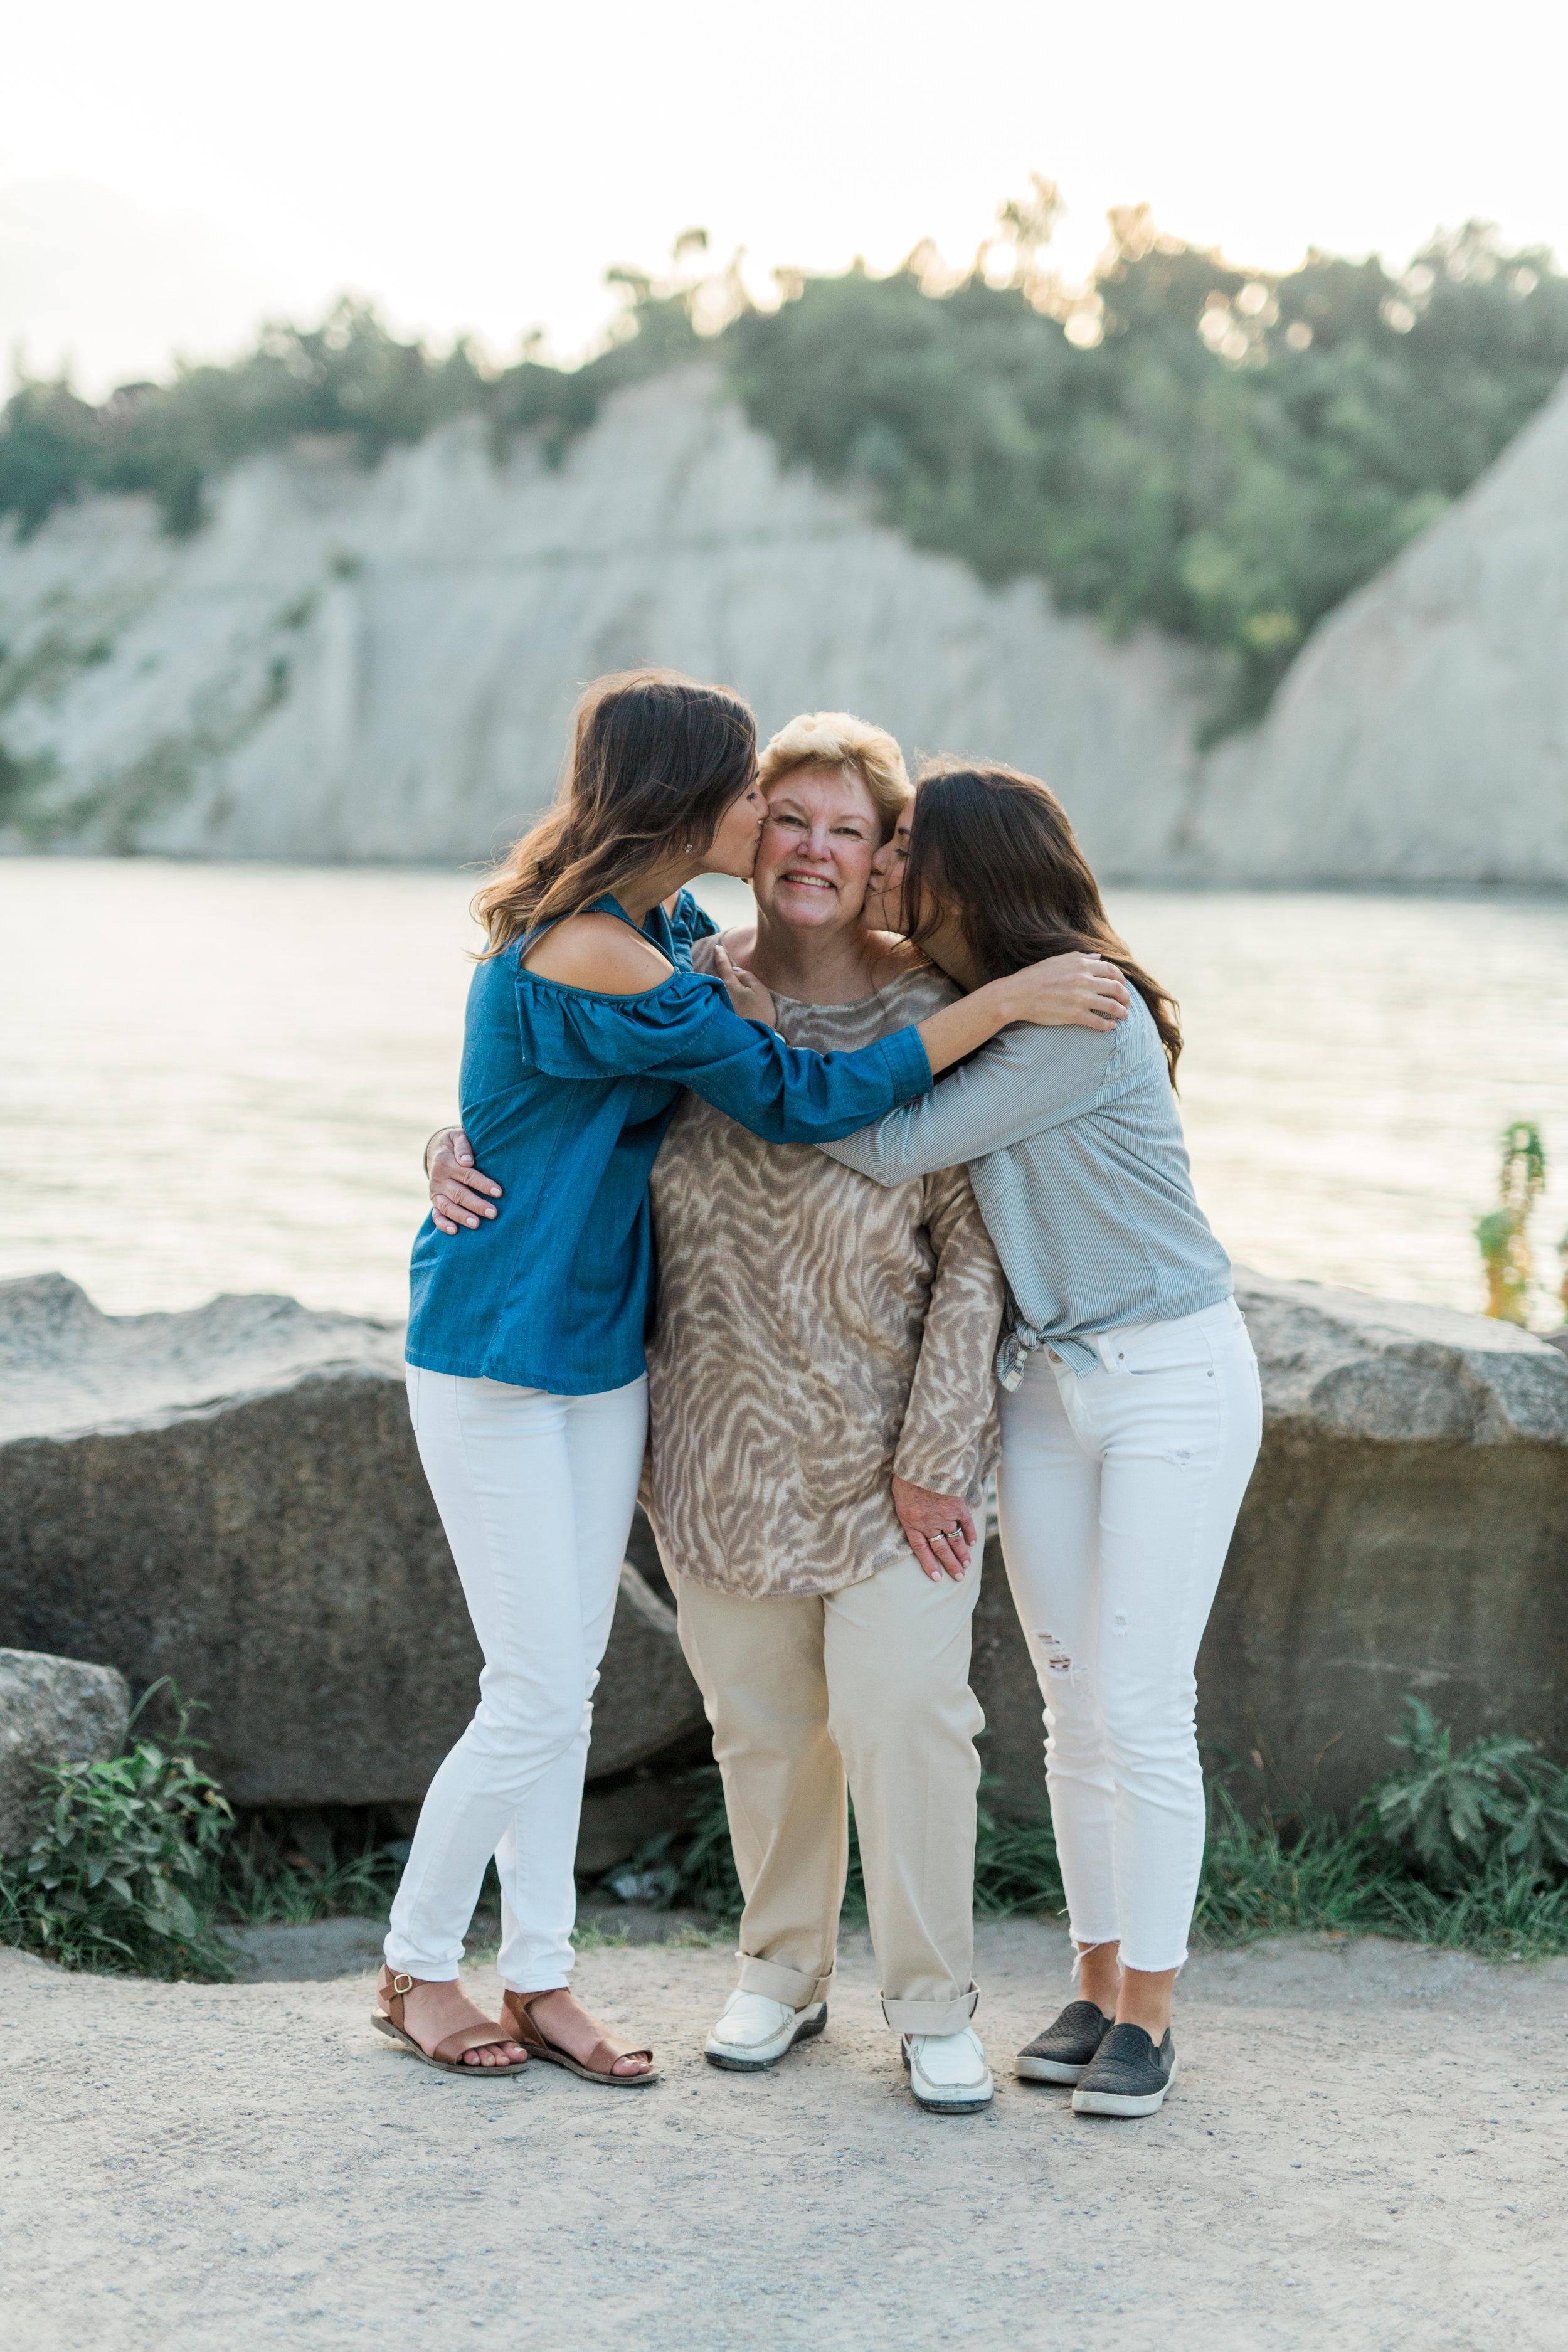 Danielle-Giroux-Amir-Golbazi-Genua-Family-Photography-Scarborough-Bluffs-9459.jpg